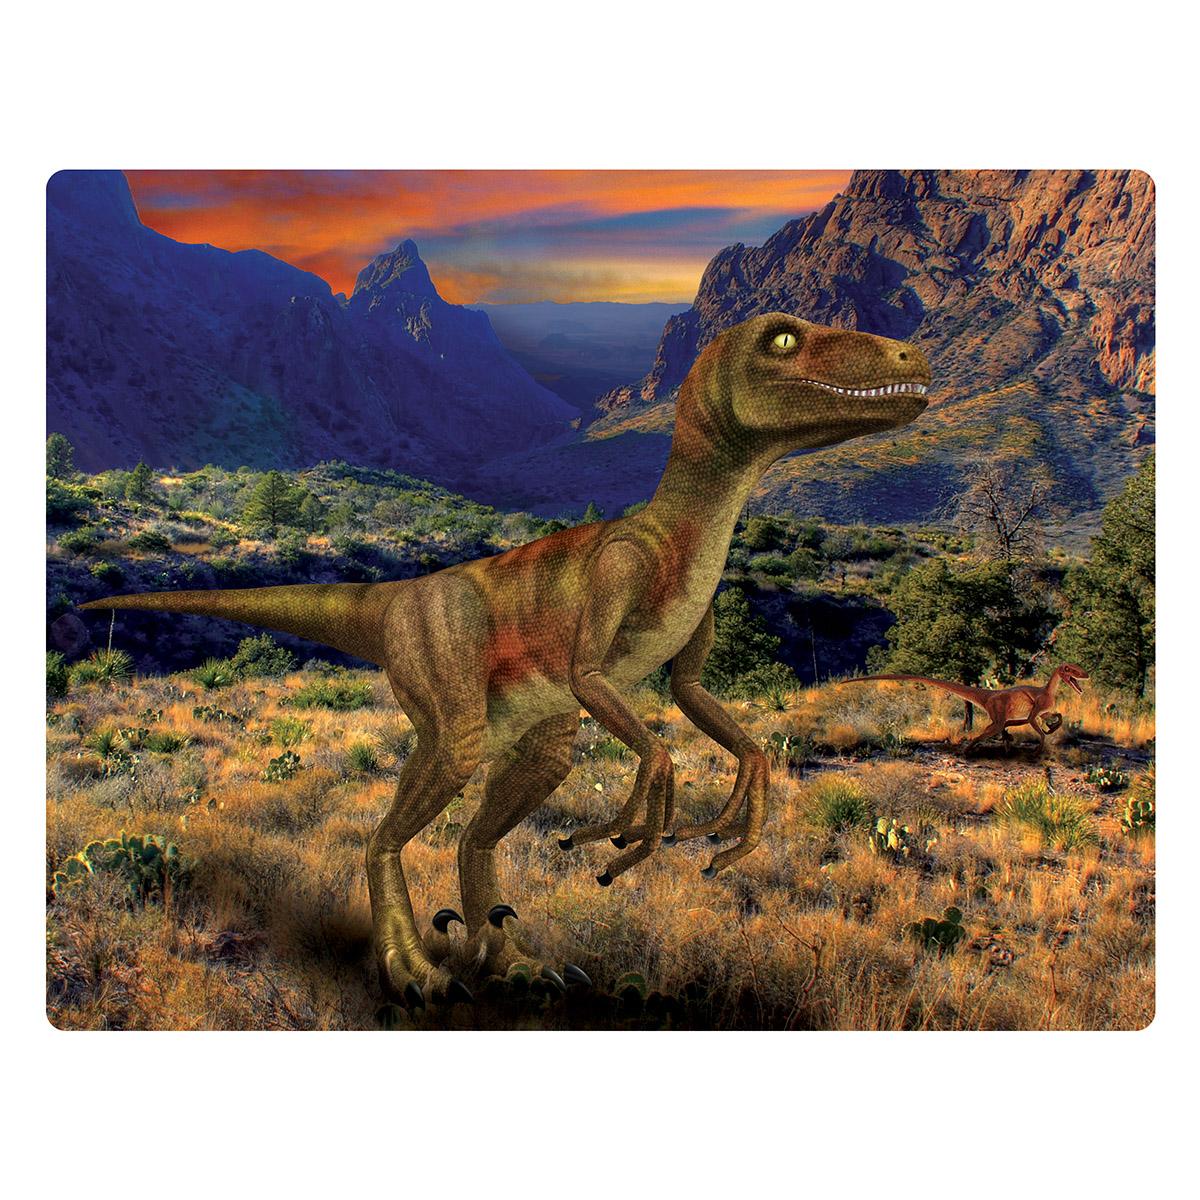 Velociraptor Dinosaurs Jigsaw Puzzle